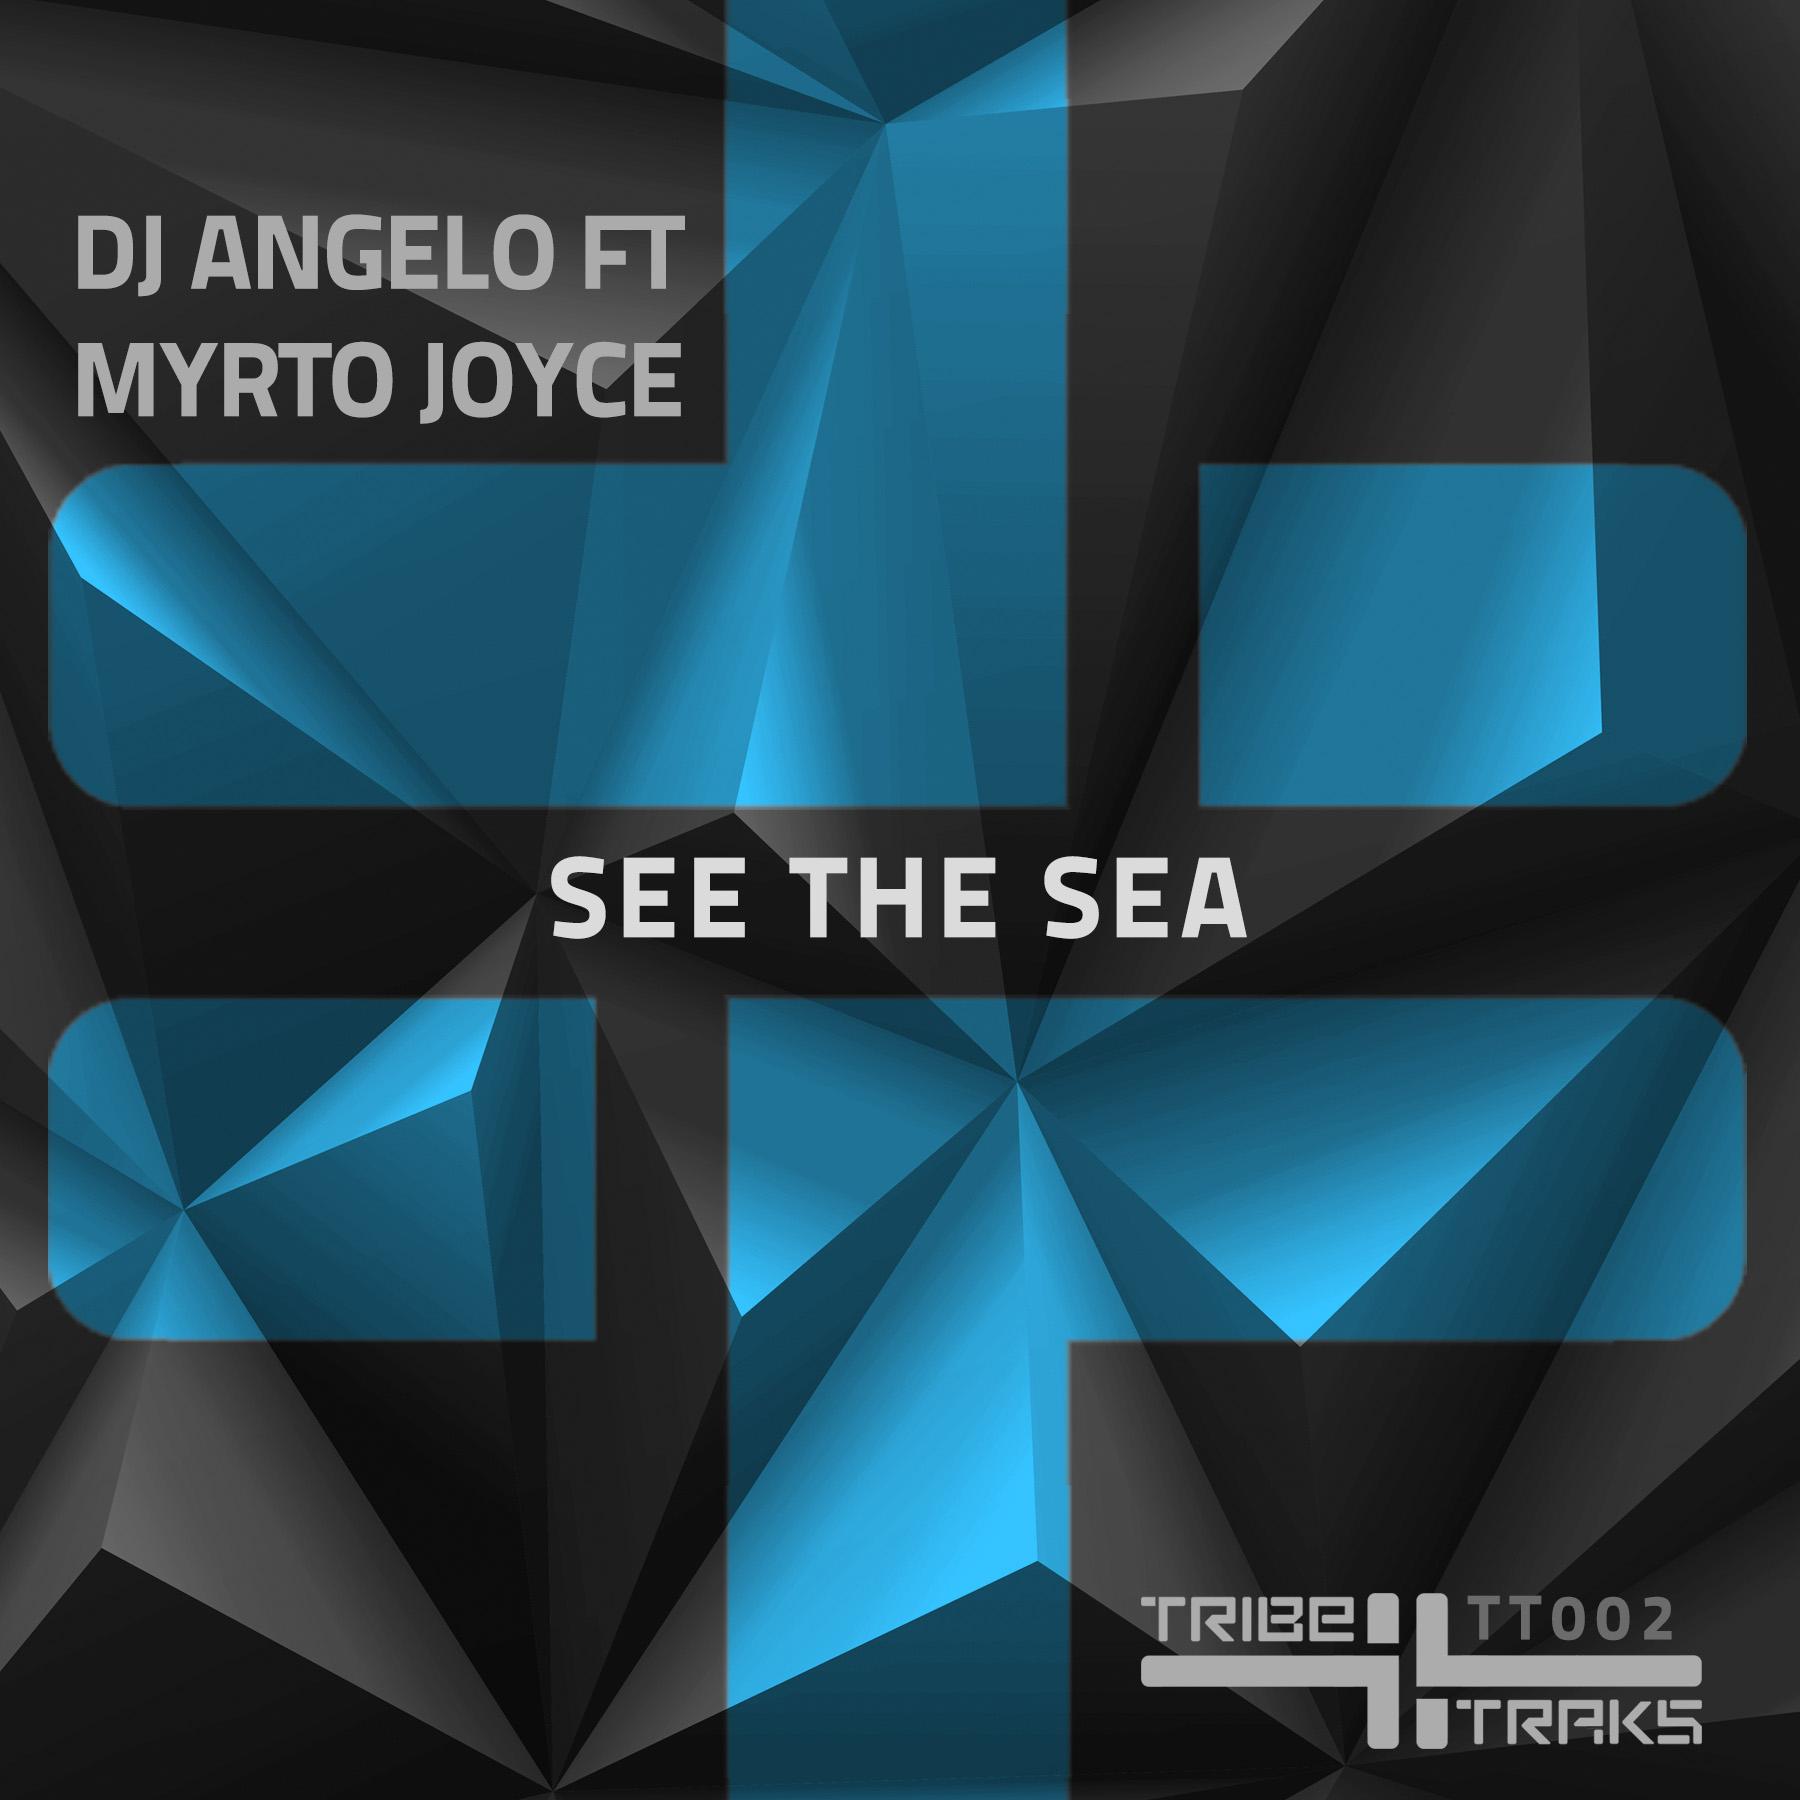 See the Sea DJ Angelo